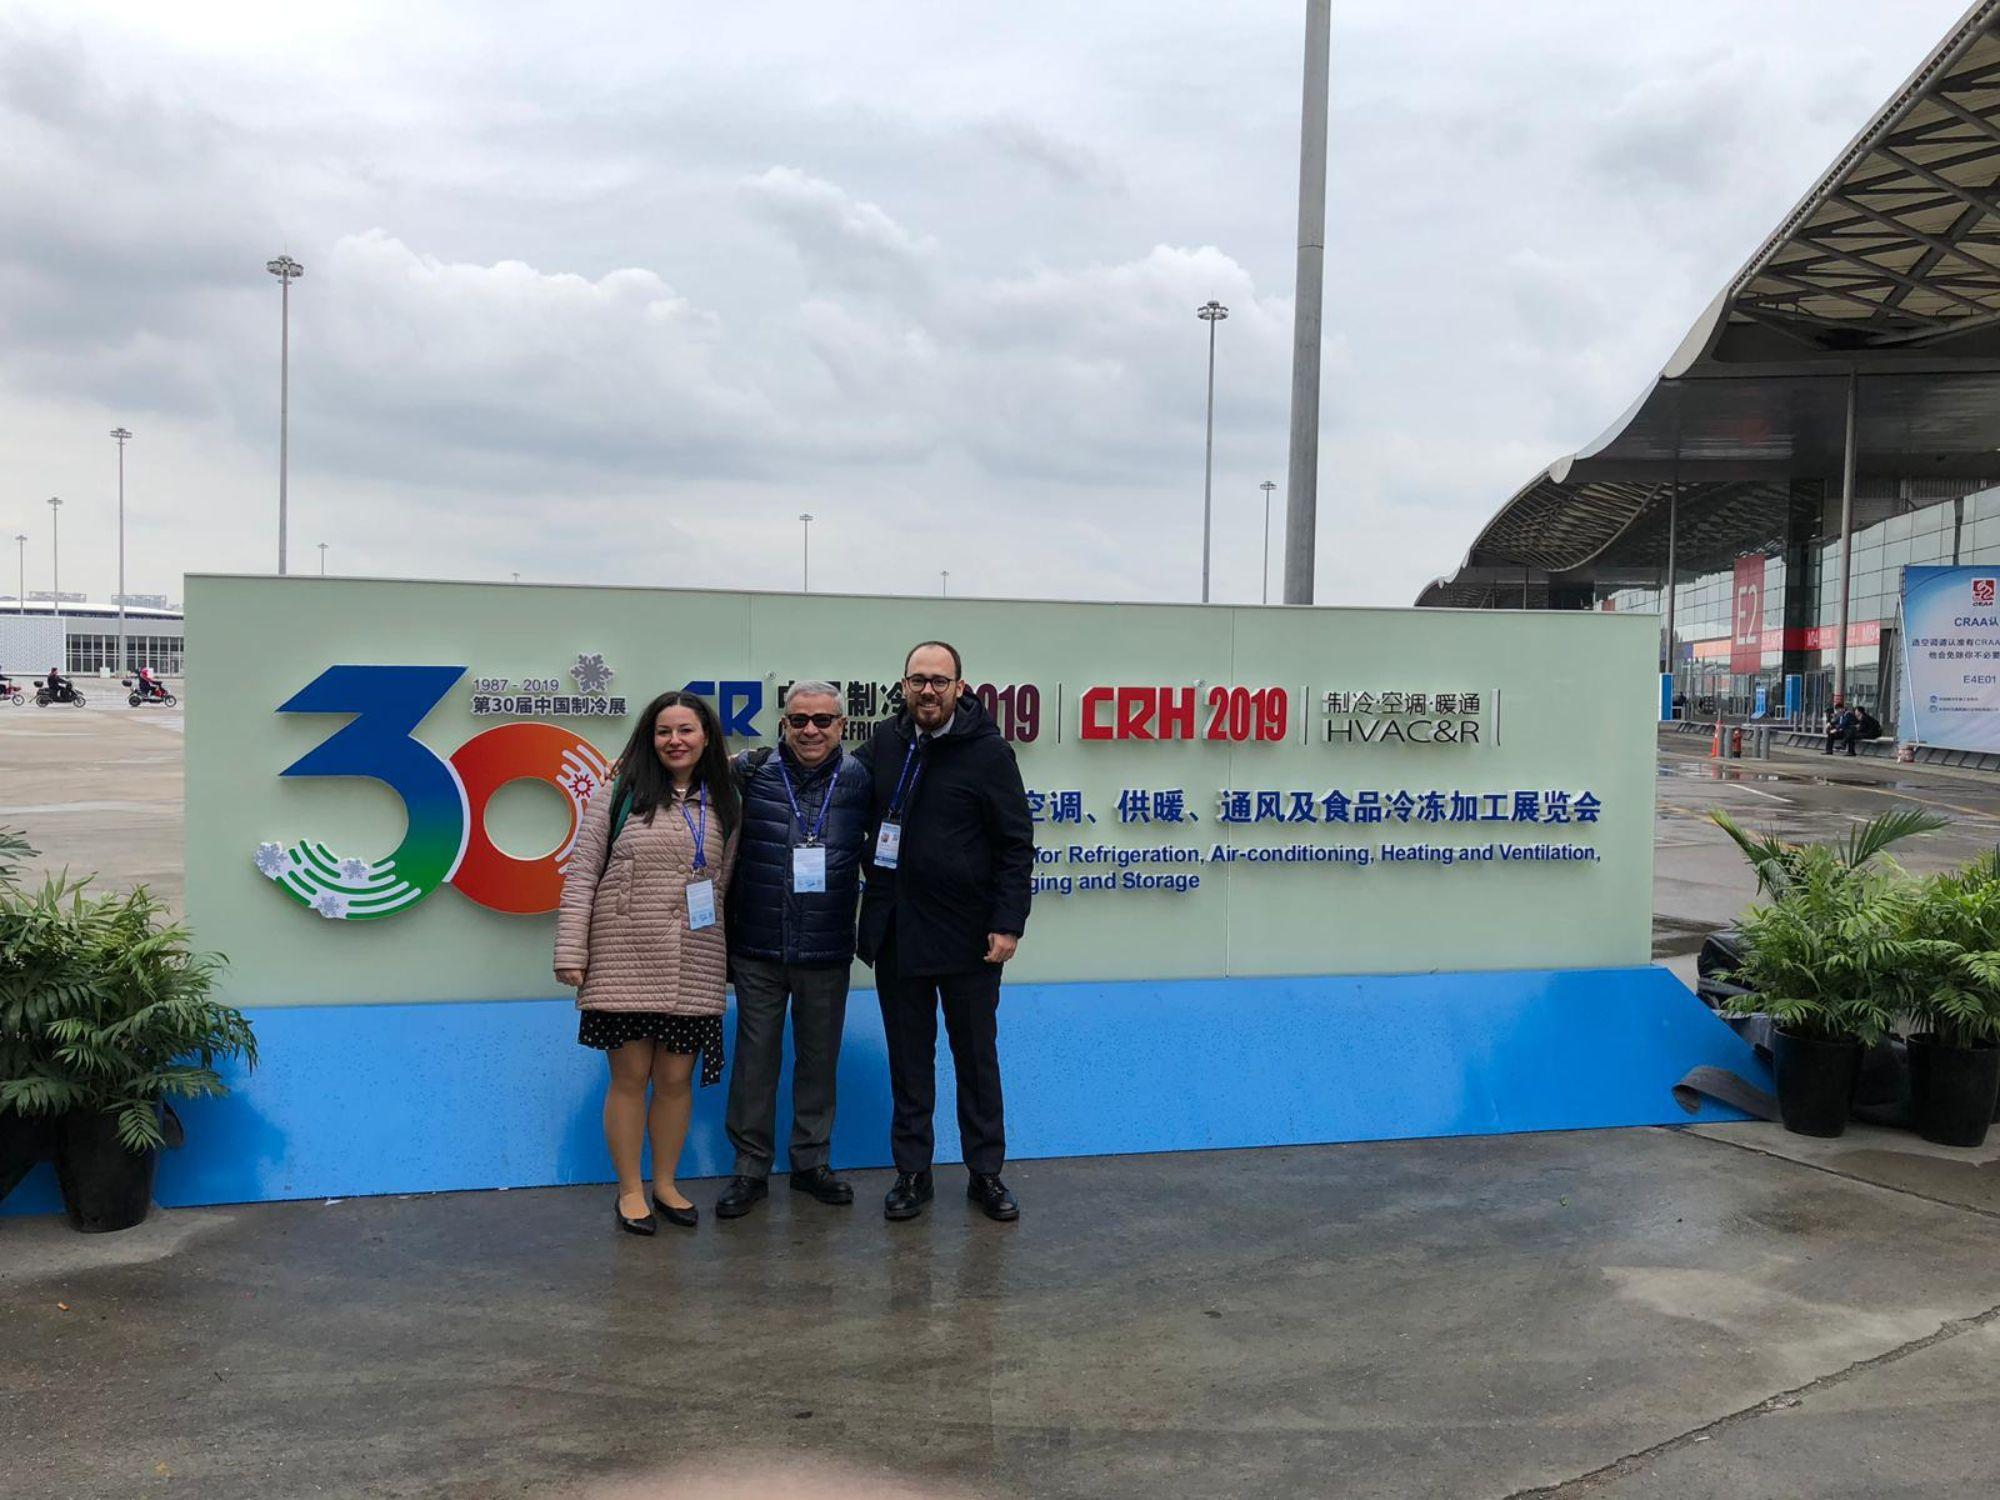 AFTER CHINA REFRIGERATION 2019 | UNILAB - Heat Transfer Software